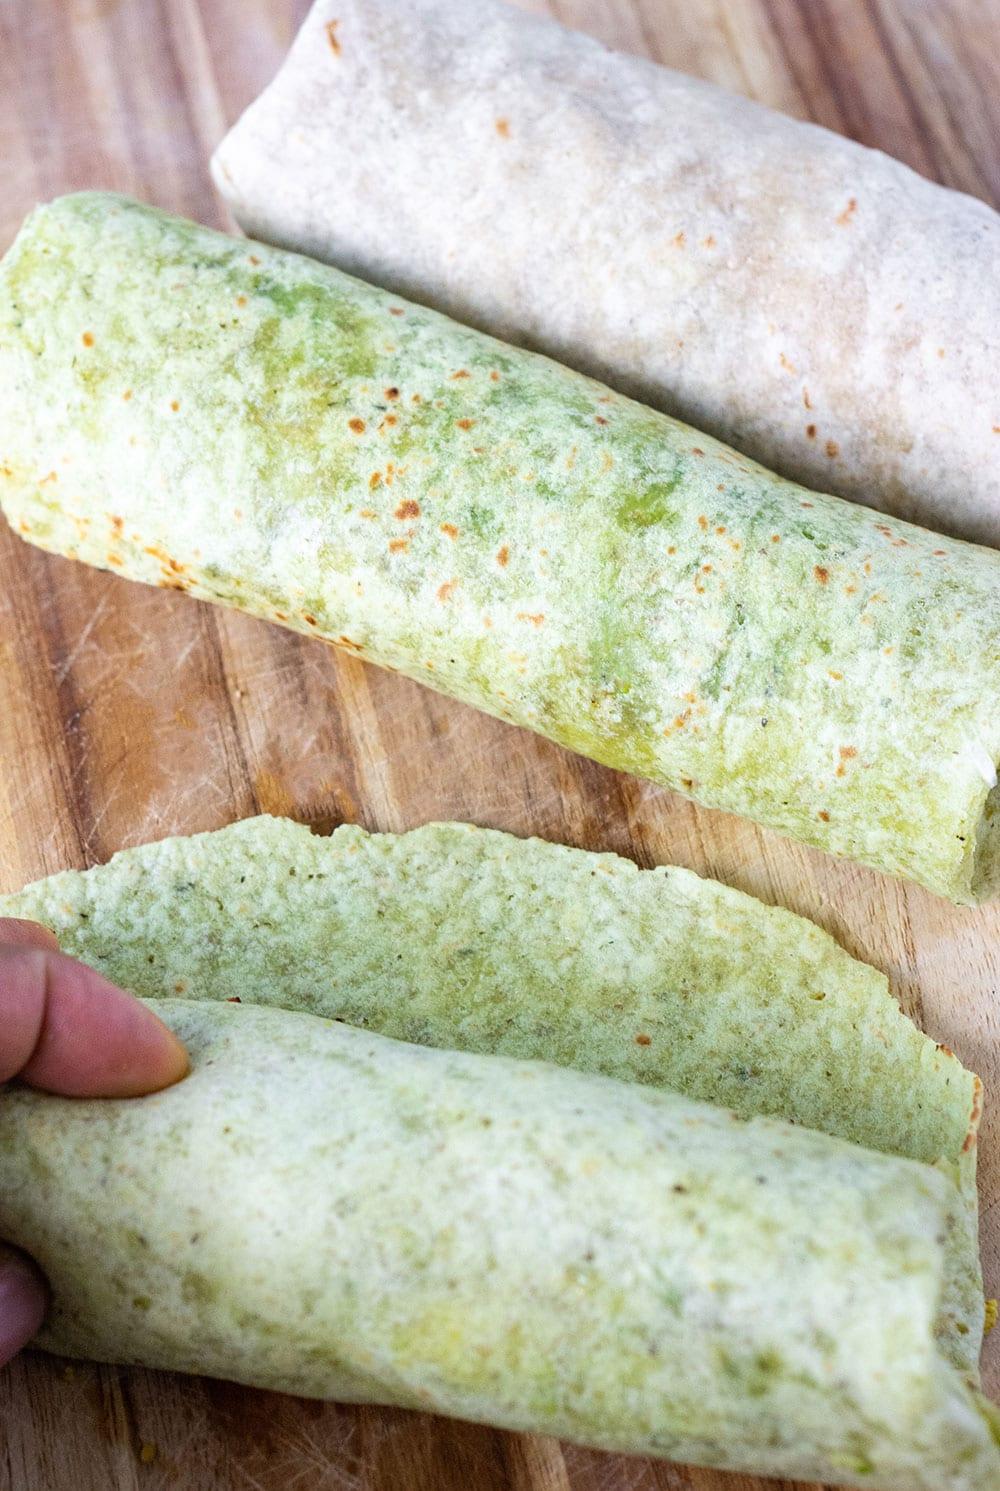 Vegan breakfast burritos being wrapped